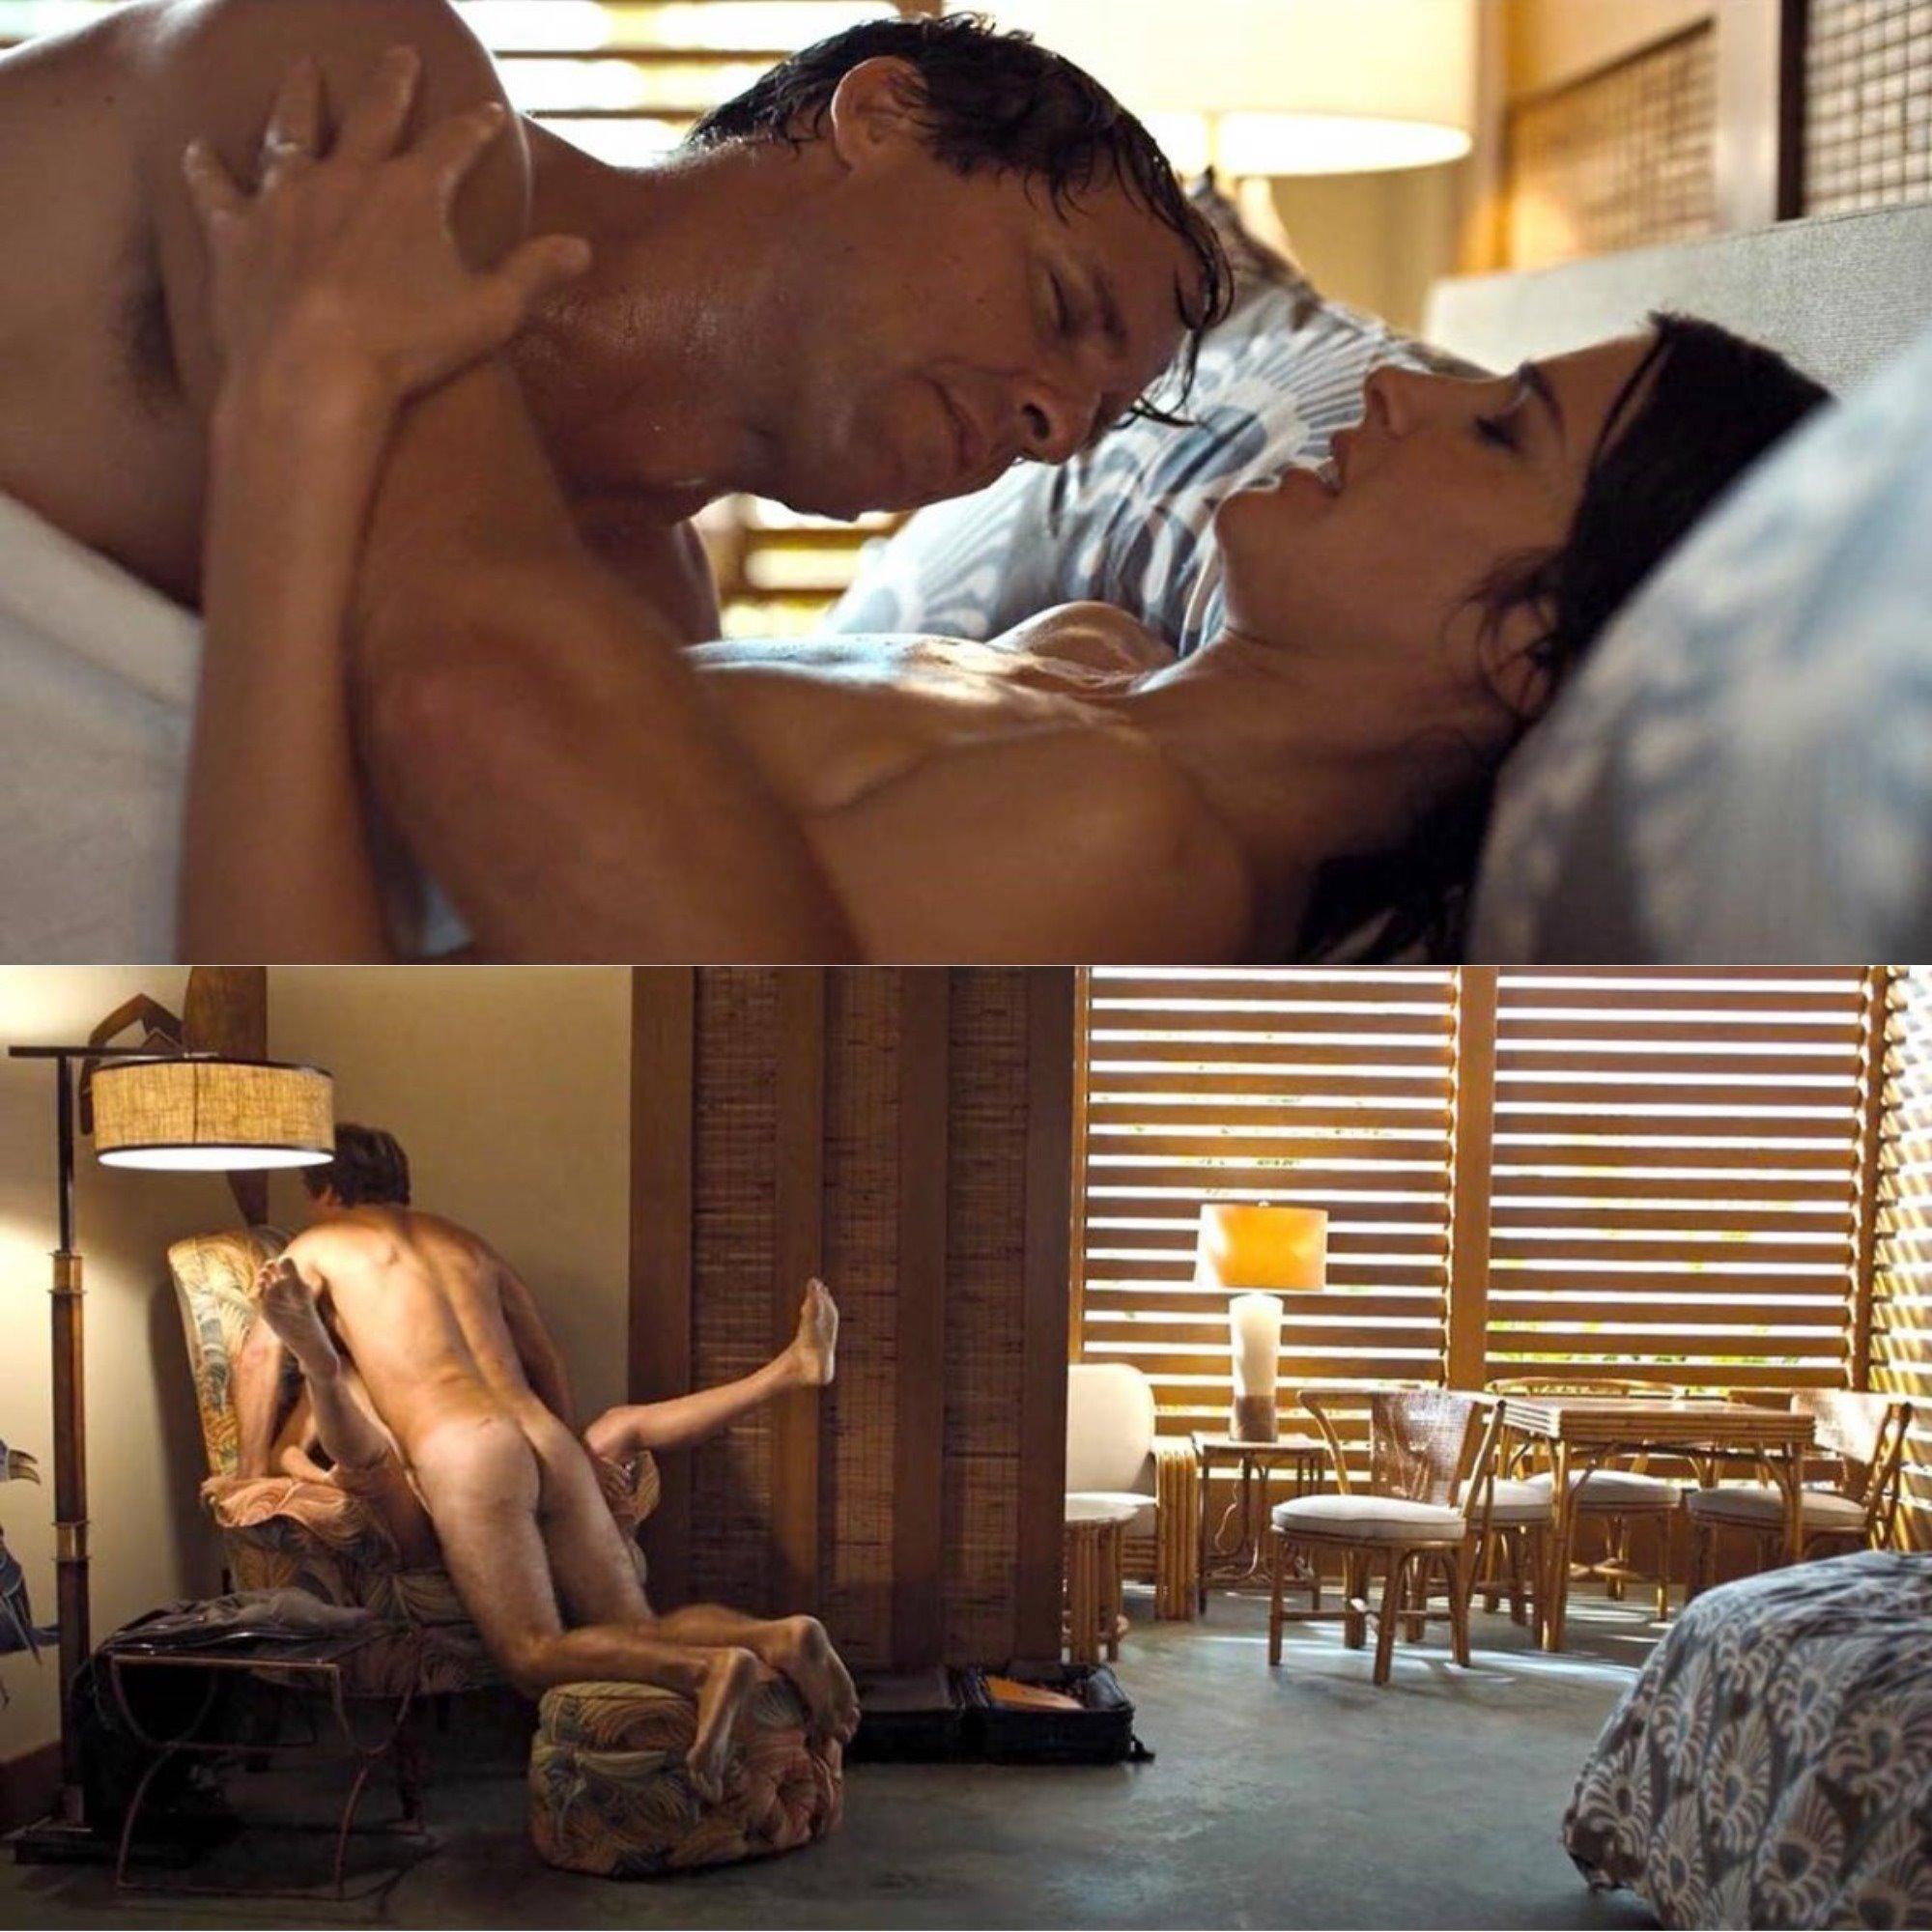 Busty asian women japanese girl nude